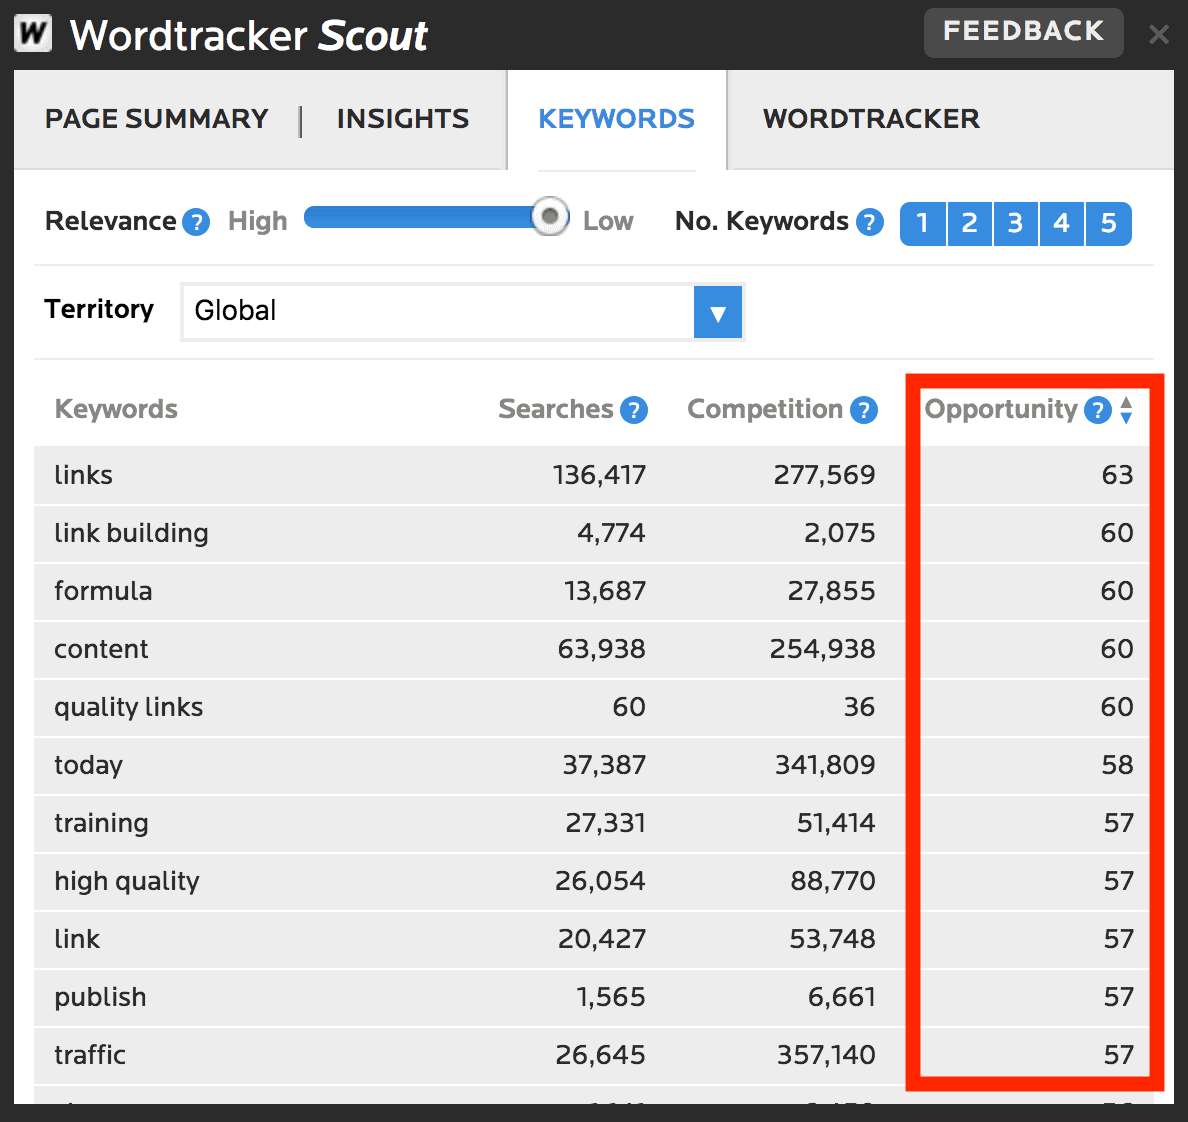 WordTracker Scout – Opportunity